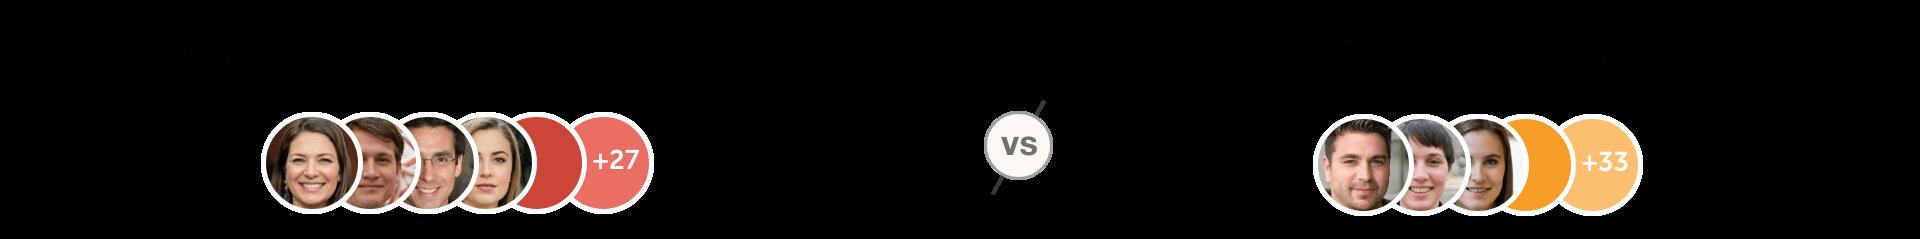 marmara-vs-ege-bolgesi-satis-ekibi